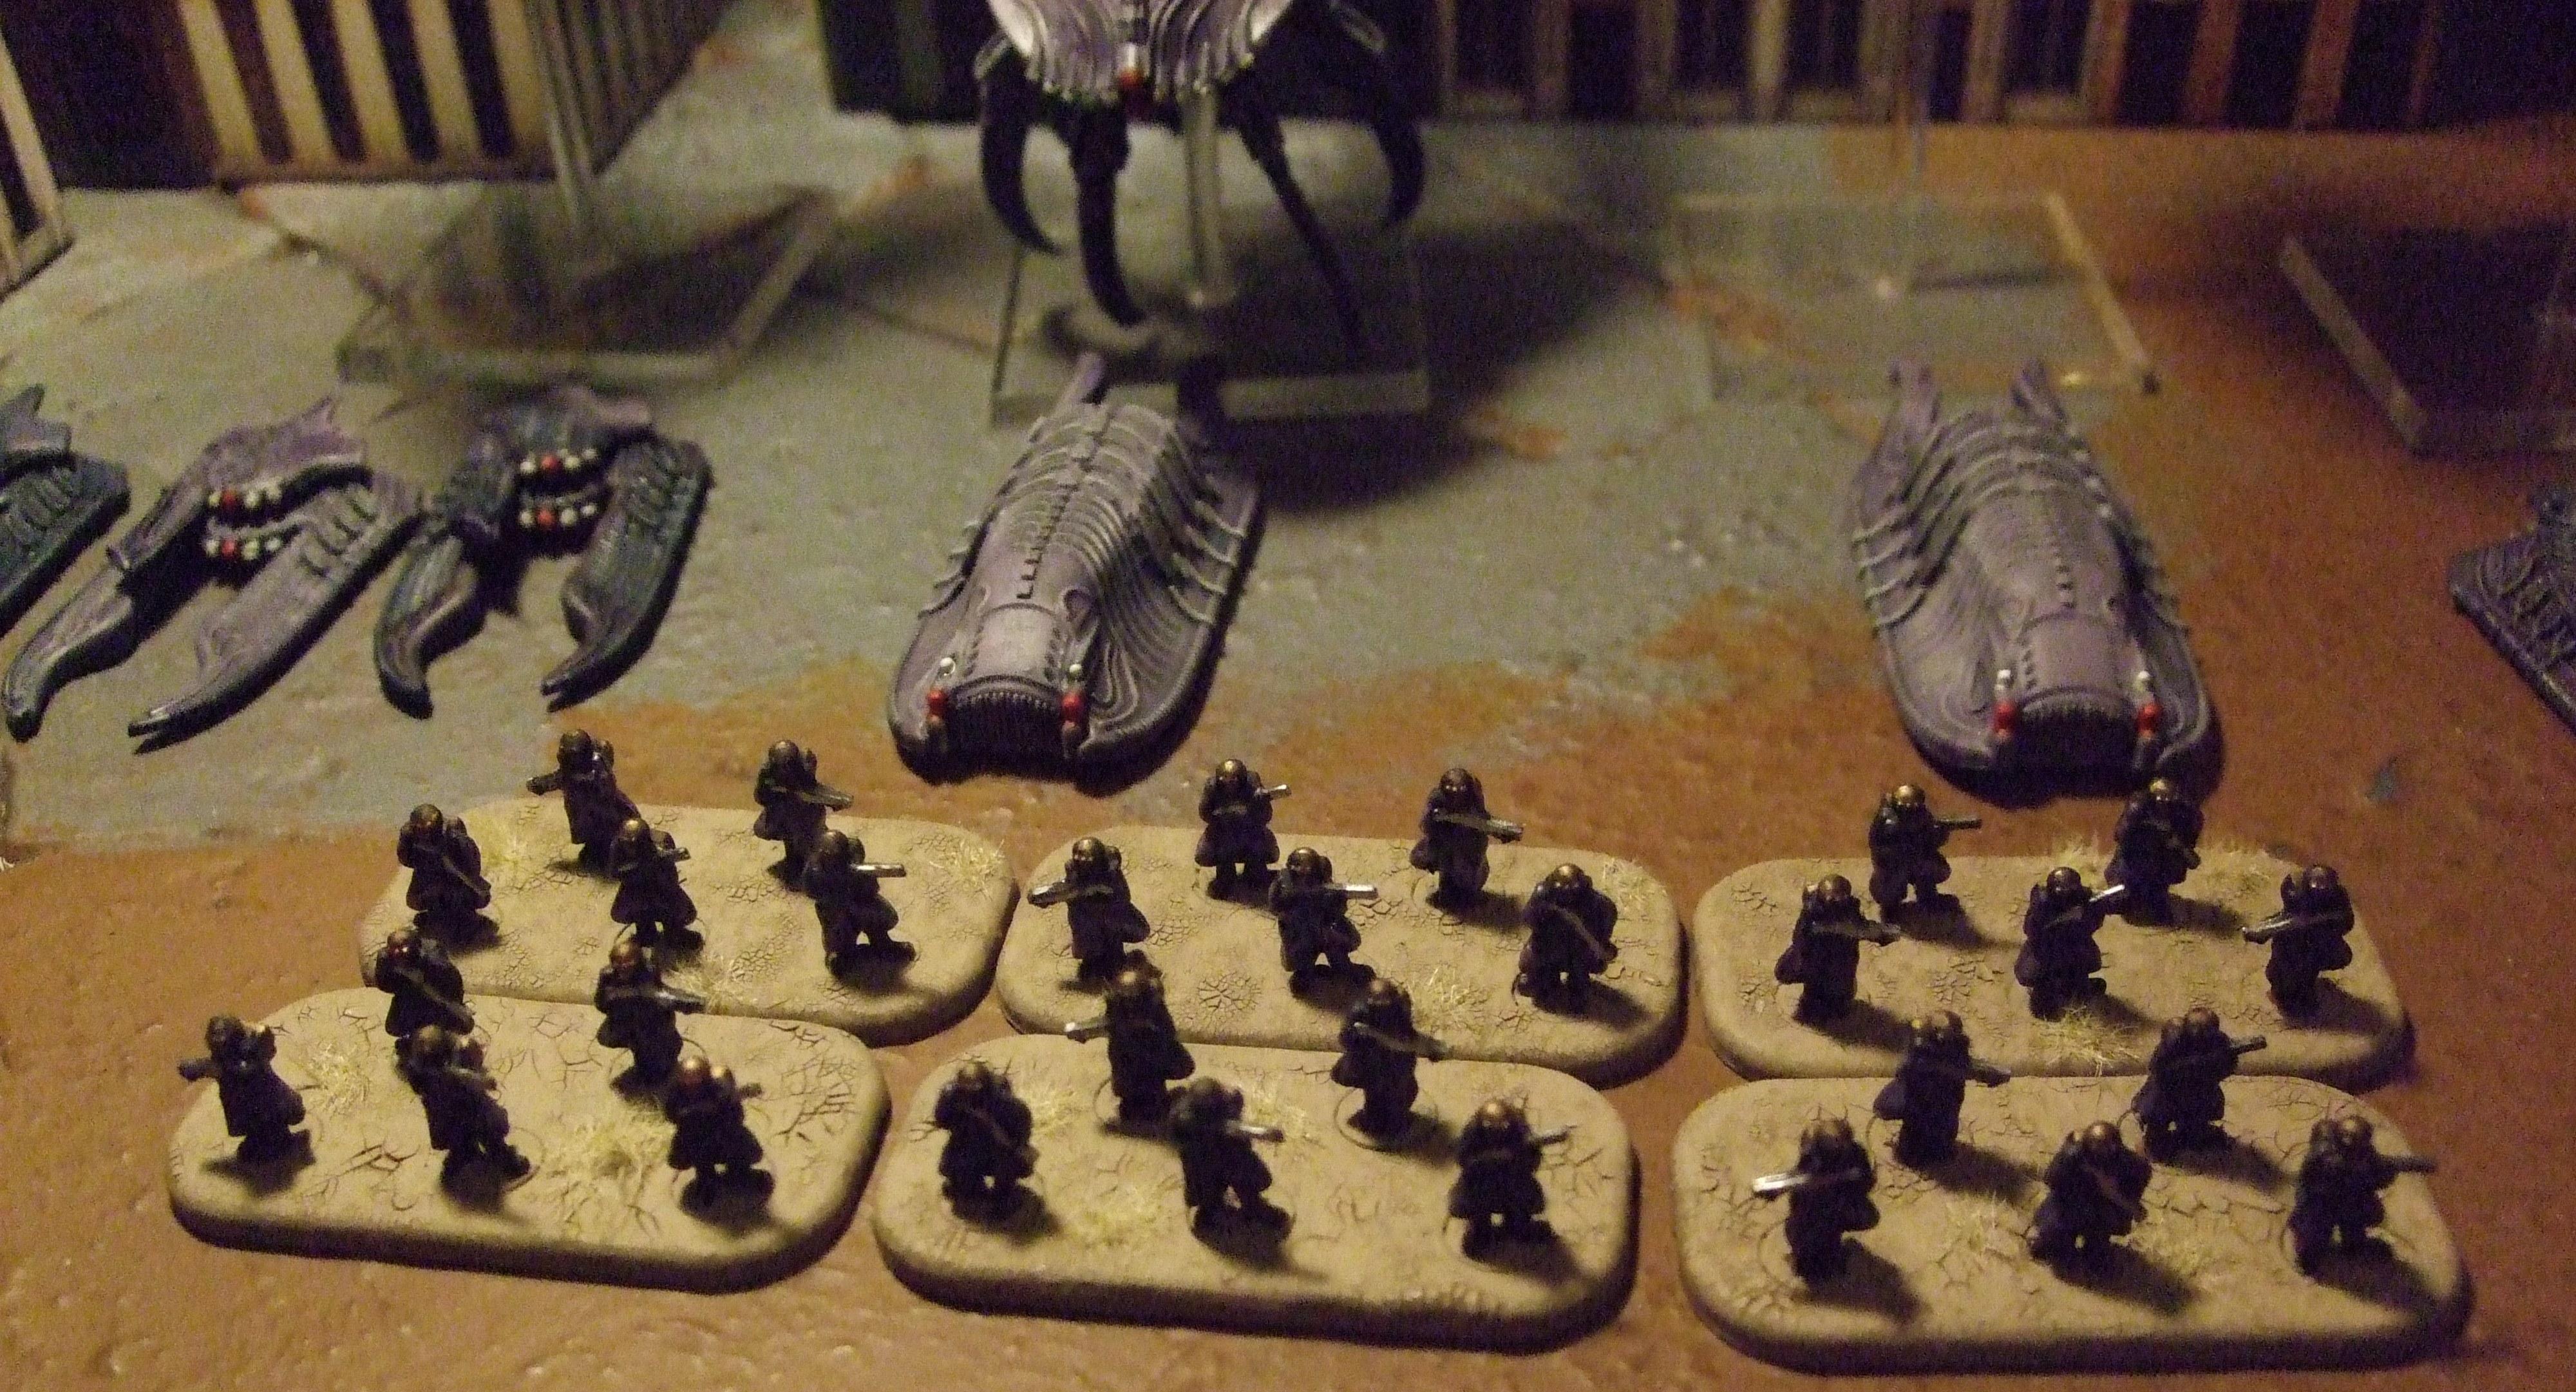 Agrellan Earth, Dropzone, Dropzone Commander, Hawk Wargames, Mass Effect, Scourge, Static Grass